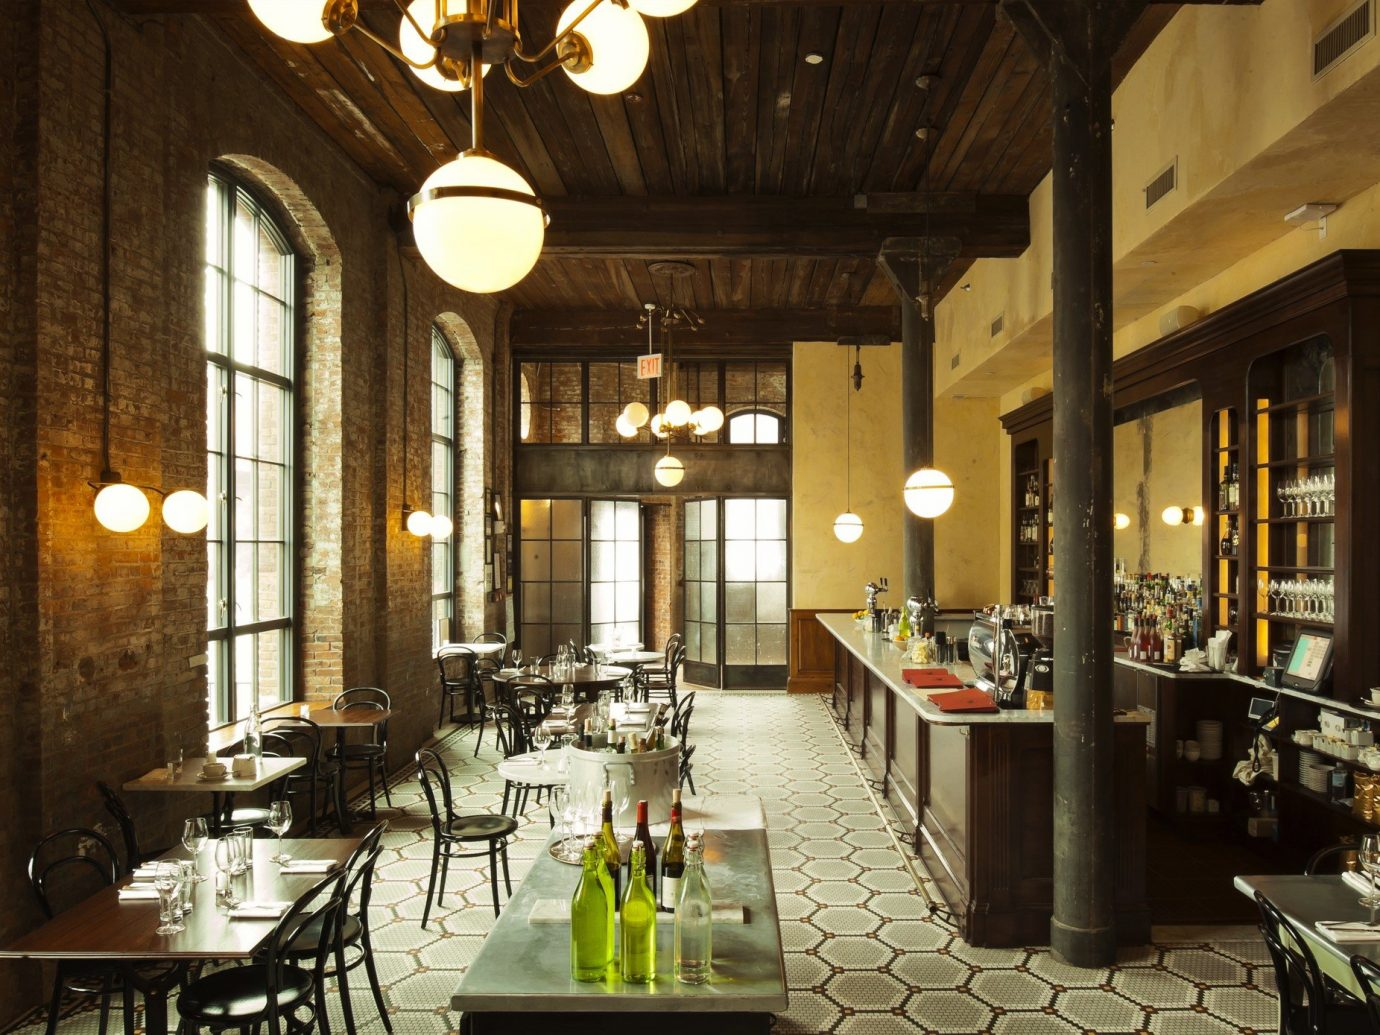 Food + Drink Hotels Romance indoor room restaurant estate ceiling interior design meal lighting Lobby palace Dining Bar mansion area furniture dining room